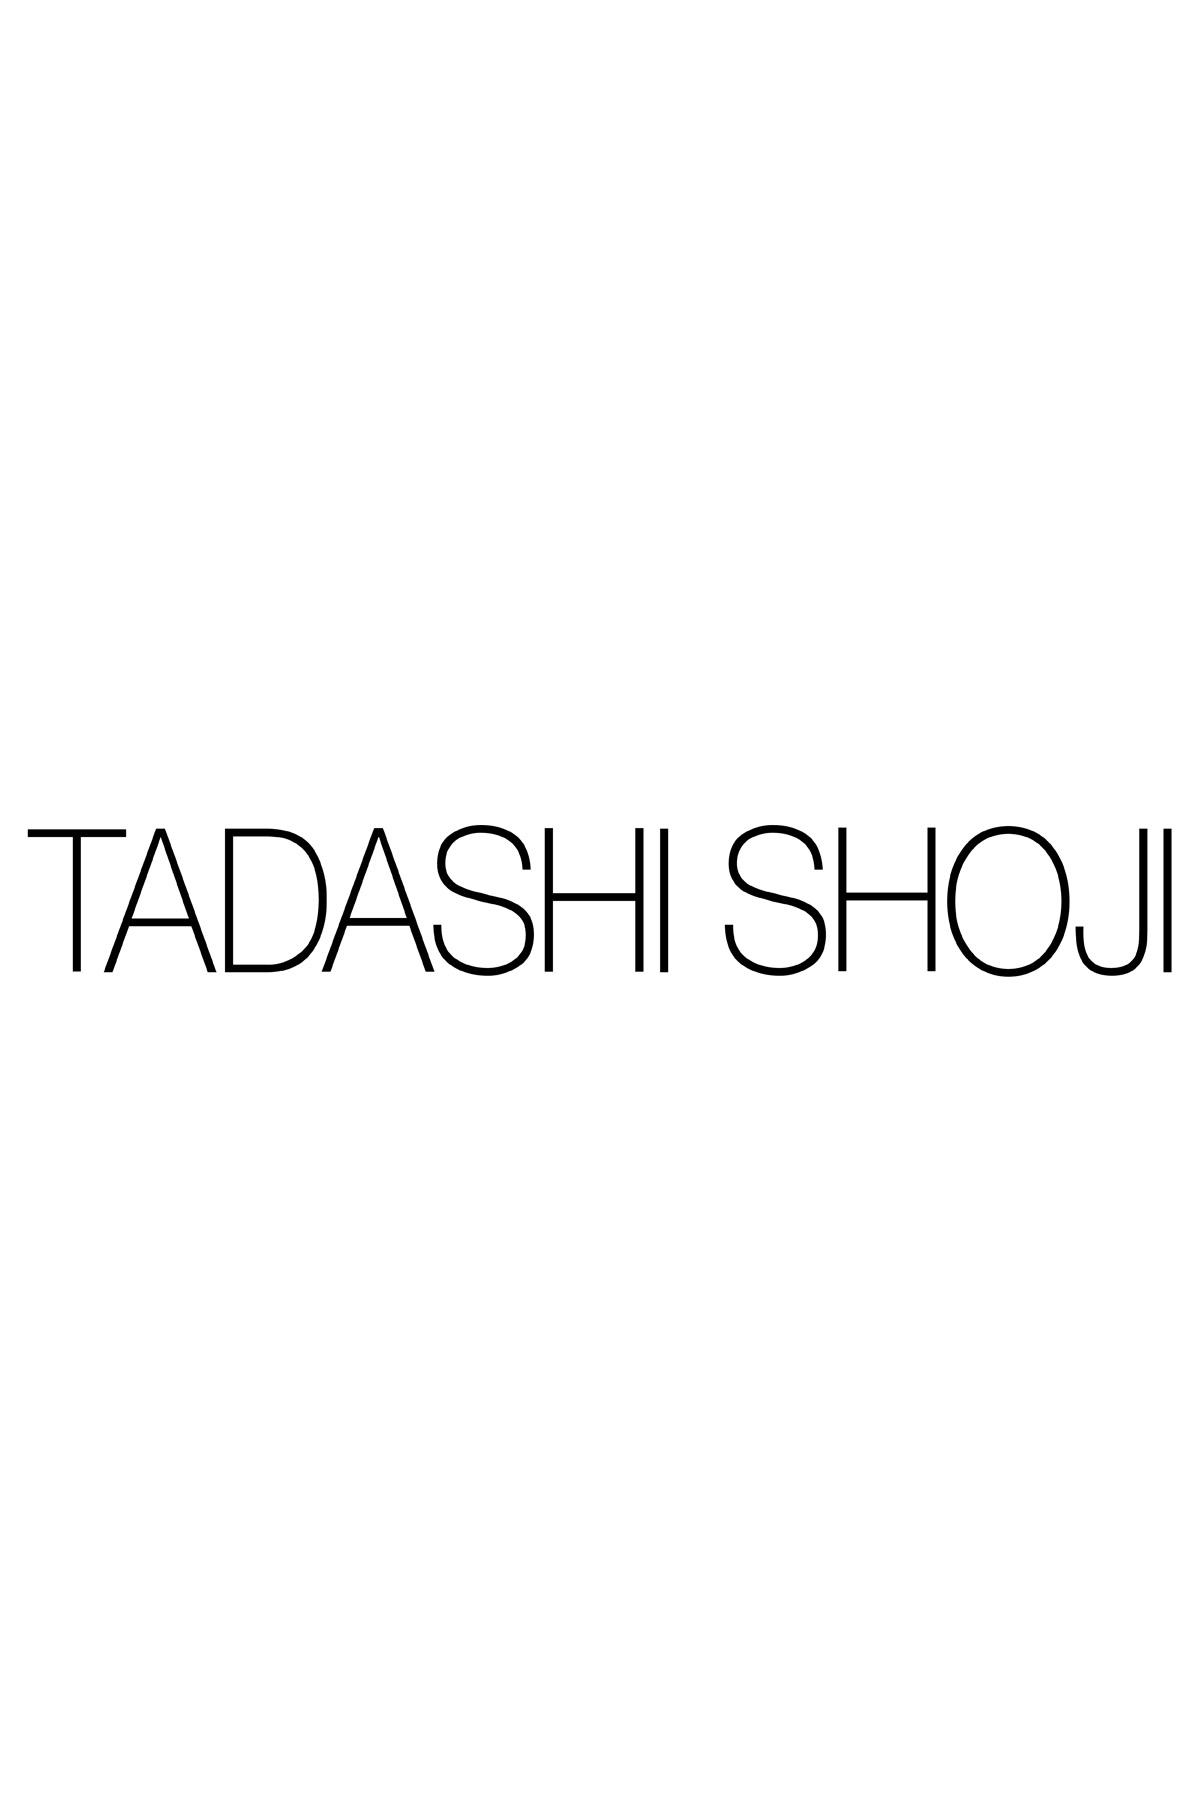 Tadashi Shoji - Monarch Dress - Detail